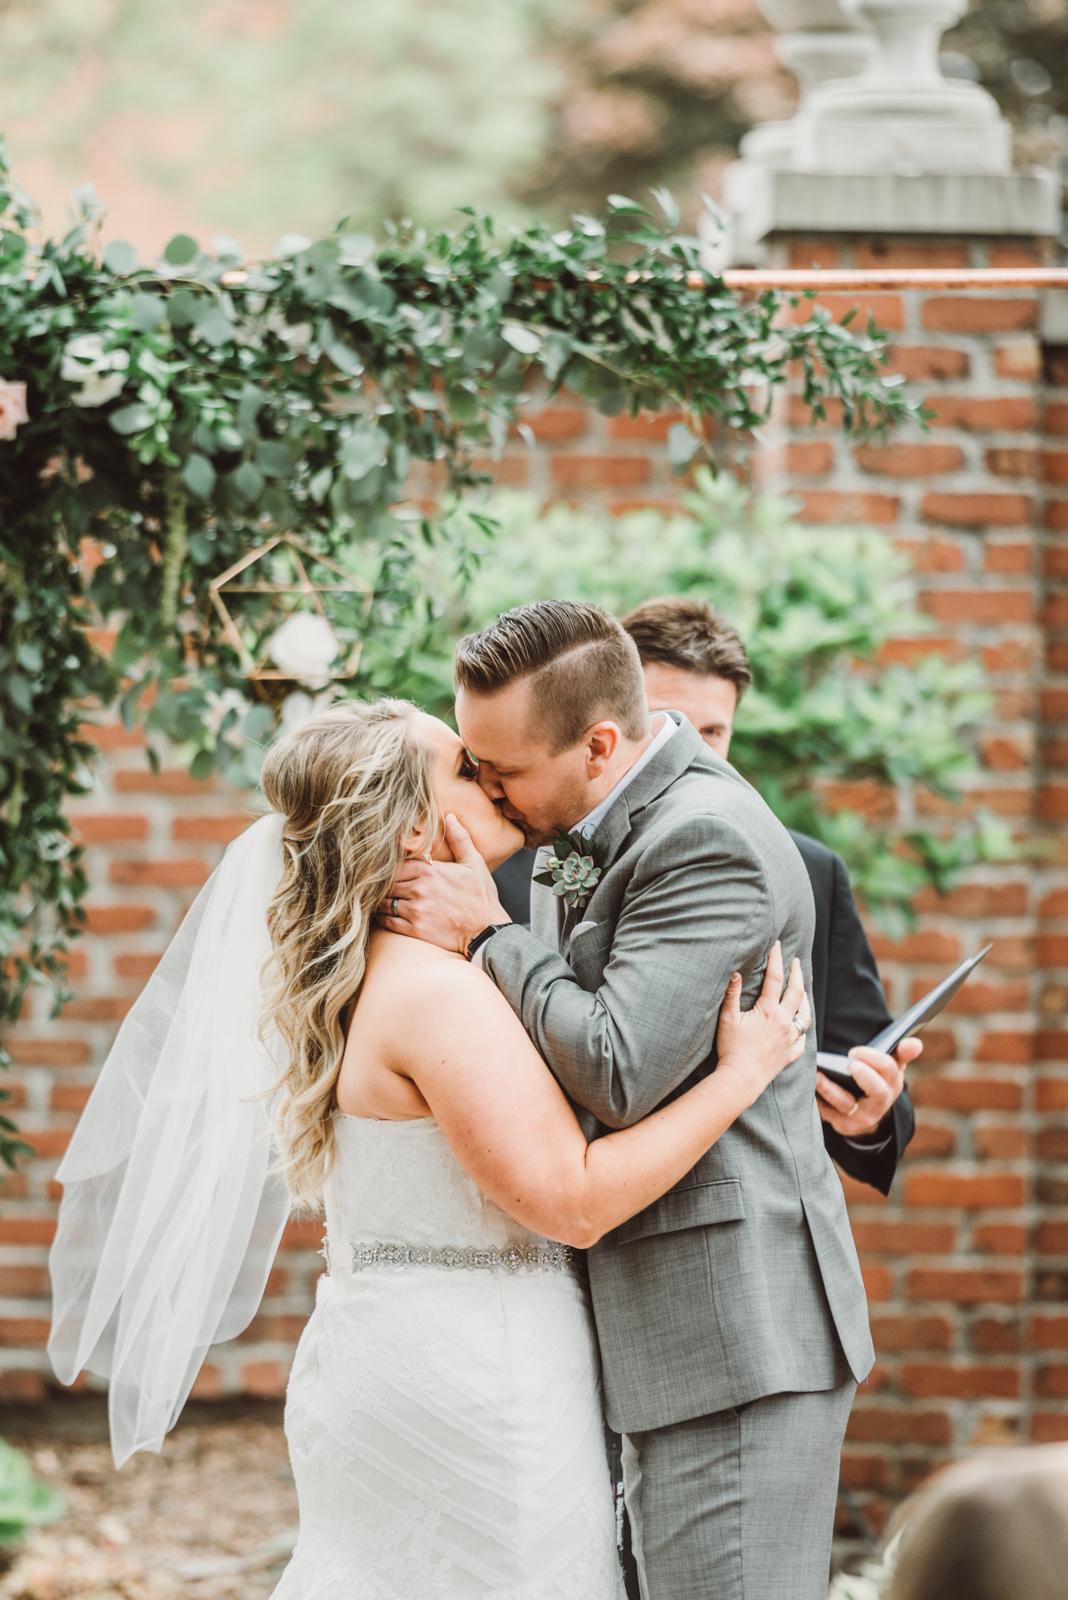 Amanda&Nick-wed-595.jpg